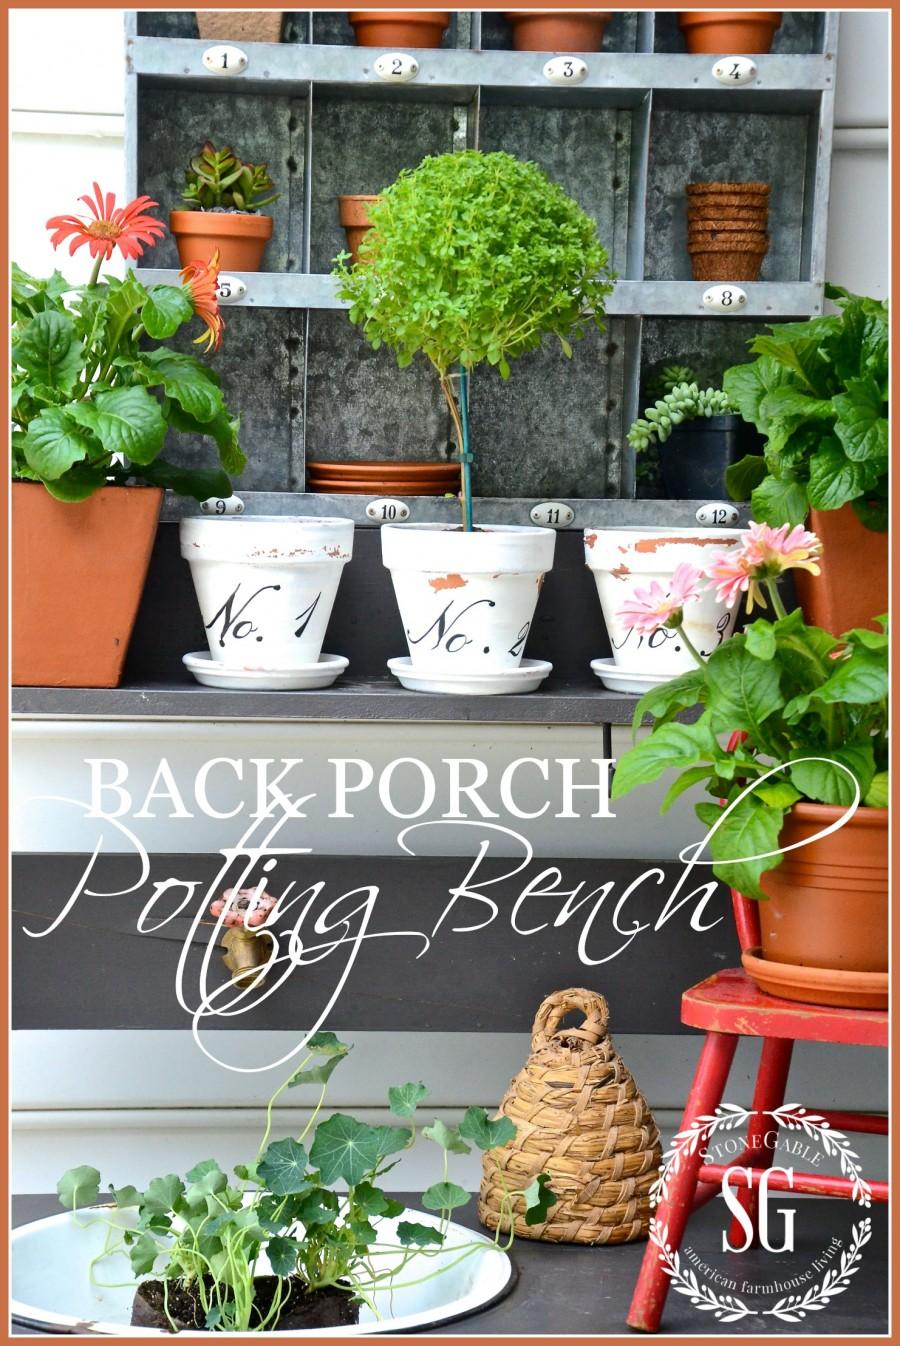 SUMMER POTTING BENCH-Small potting bench near the back porch-stonegableblog.com